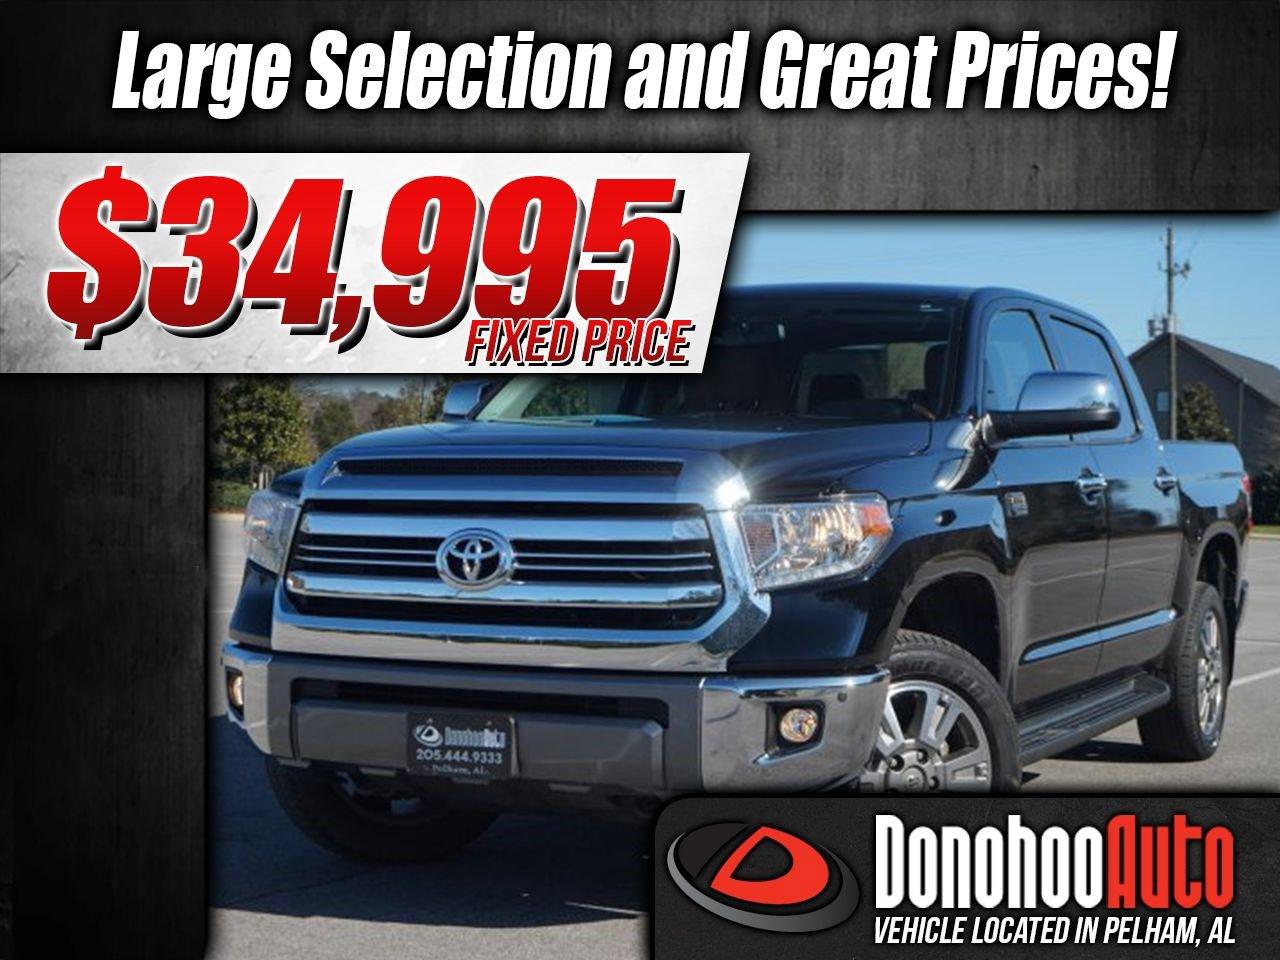 2016 Toyota Tundra 1794 Edition image